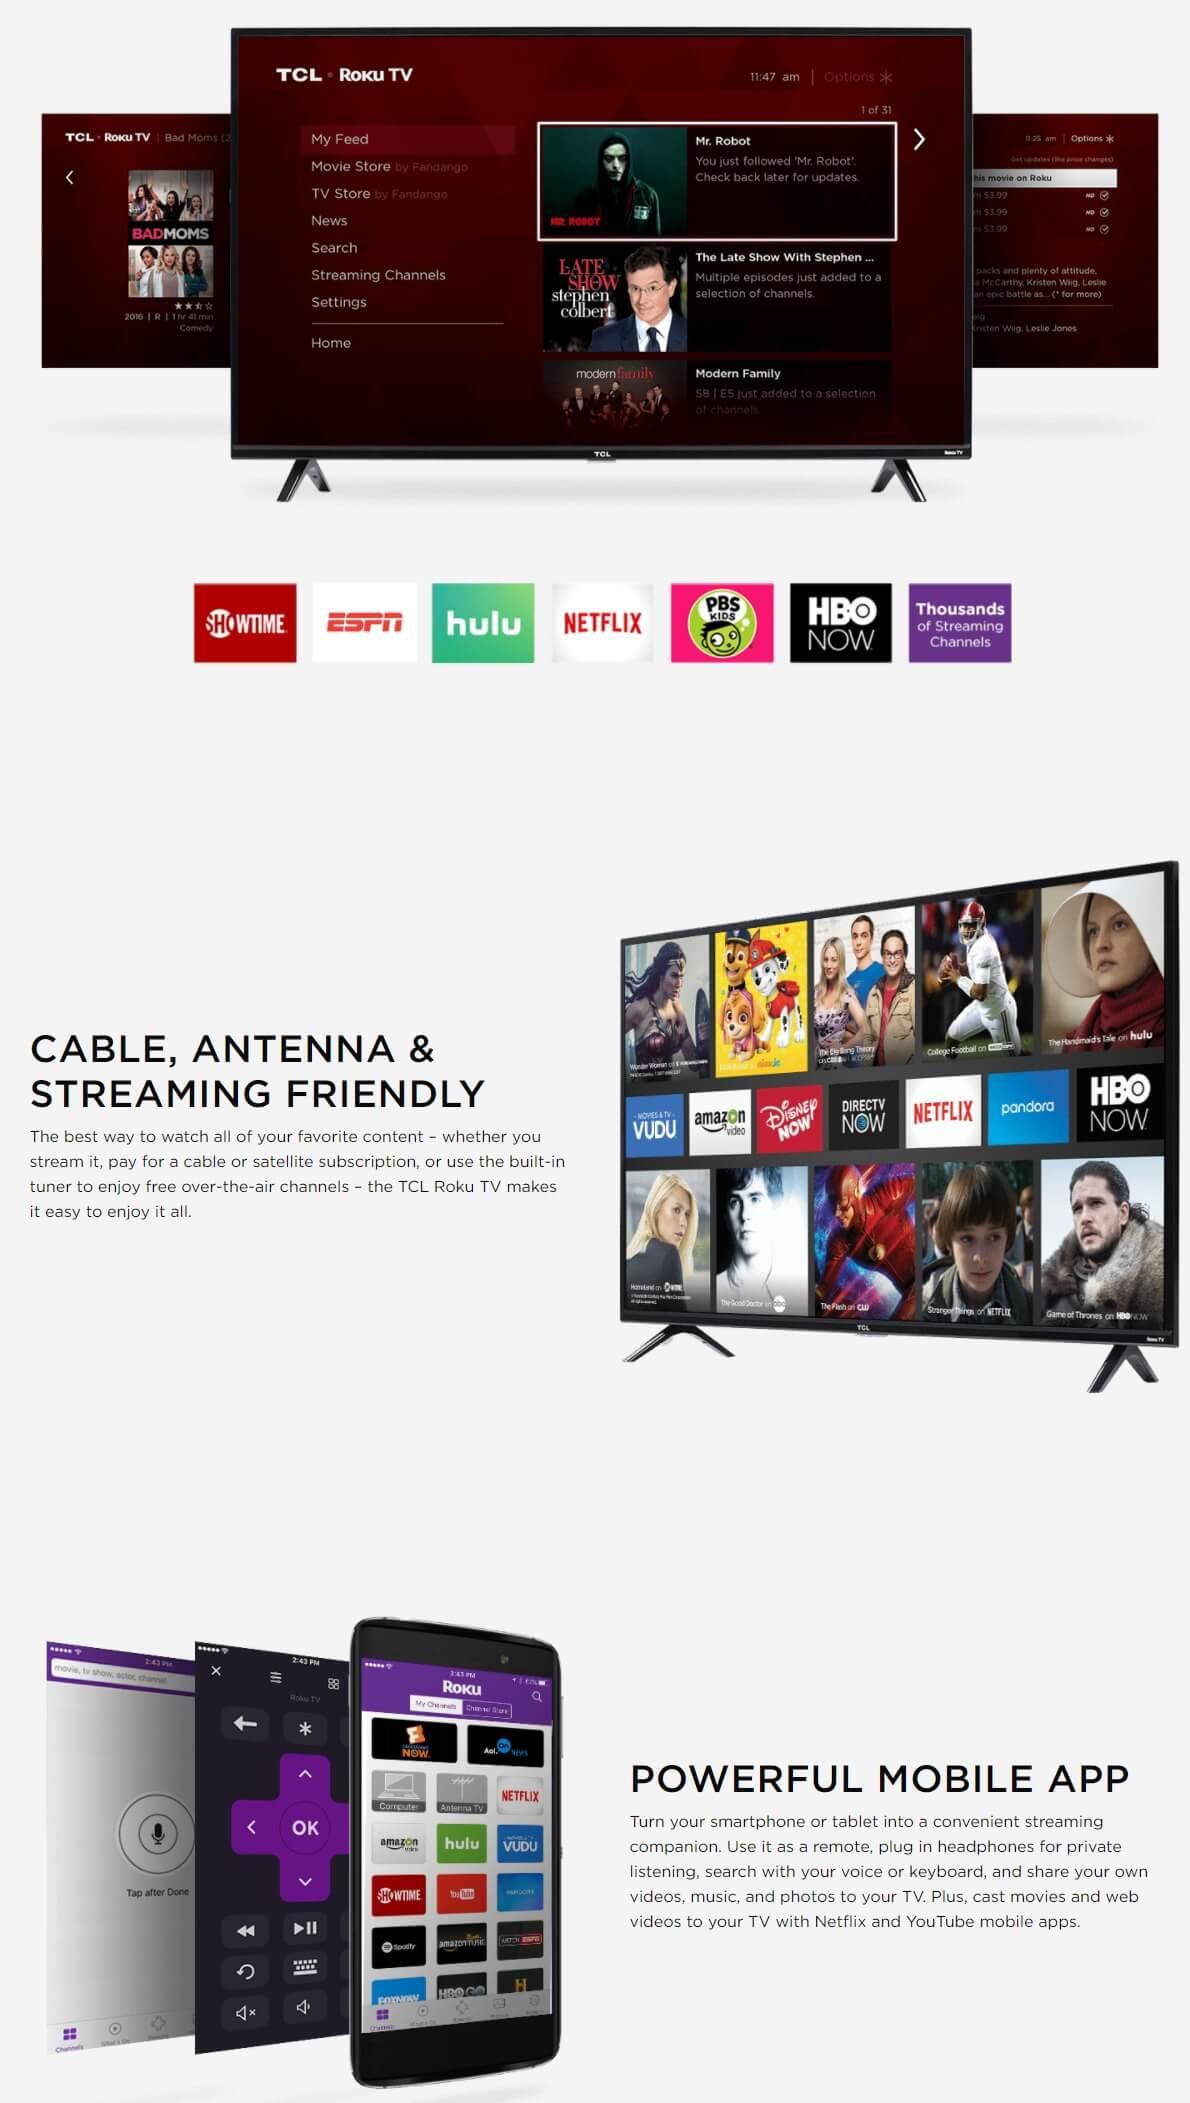 TCL 55 Class 4K UHD LED Roku Smart TV HDR 4 Series